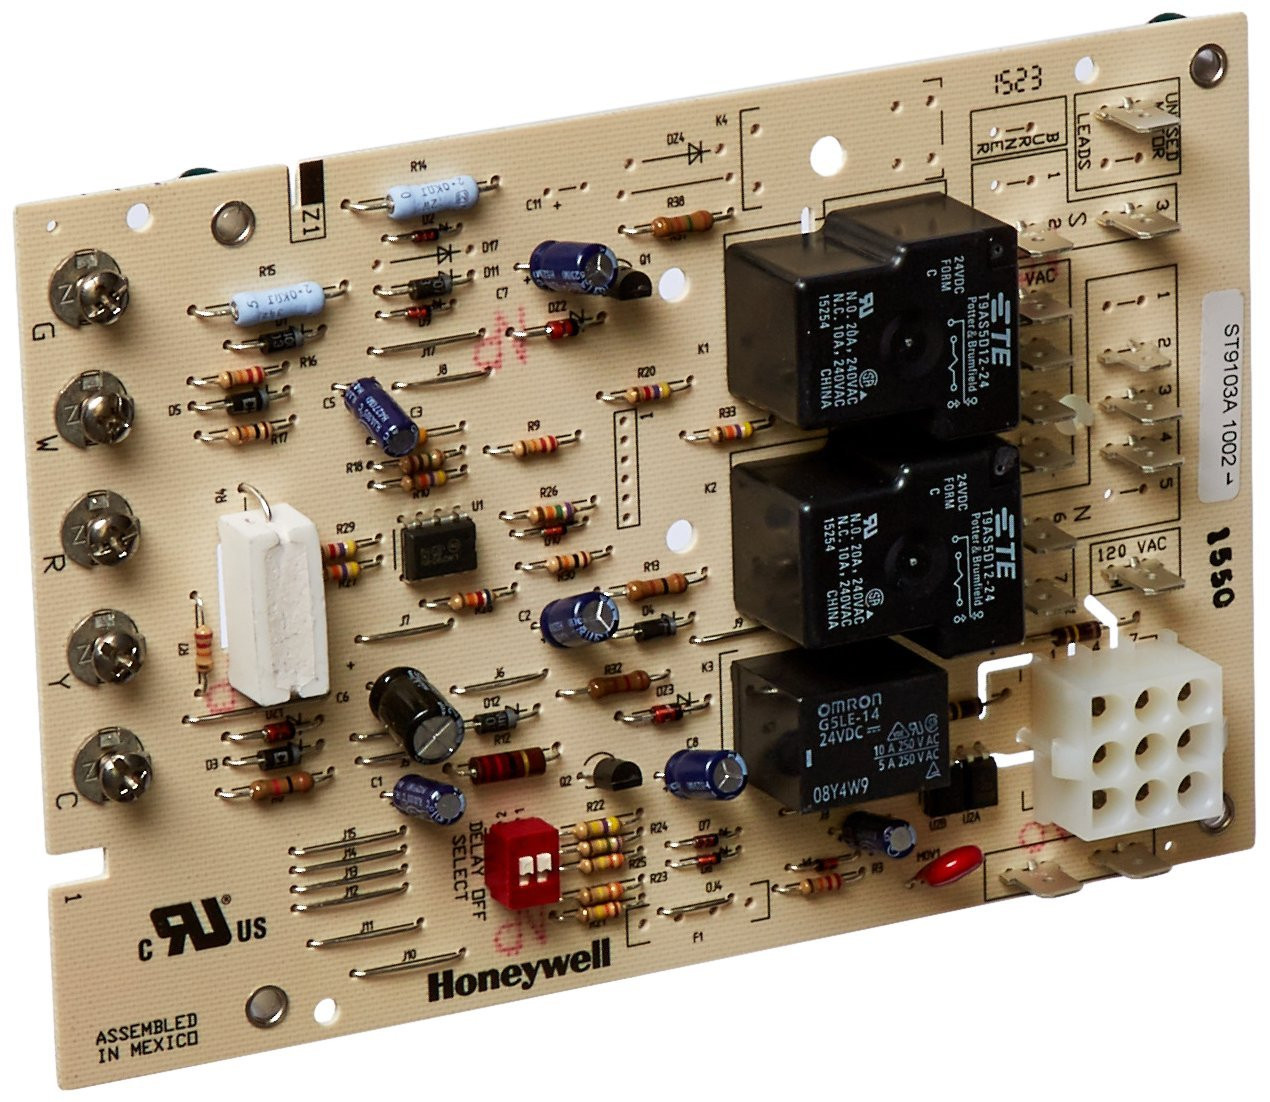 Honeywell St9103a1002 Fan Control Circuit Board Price 9169 Image 1